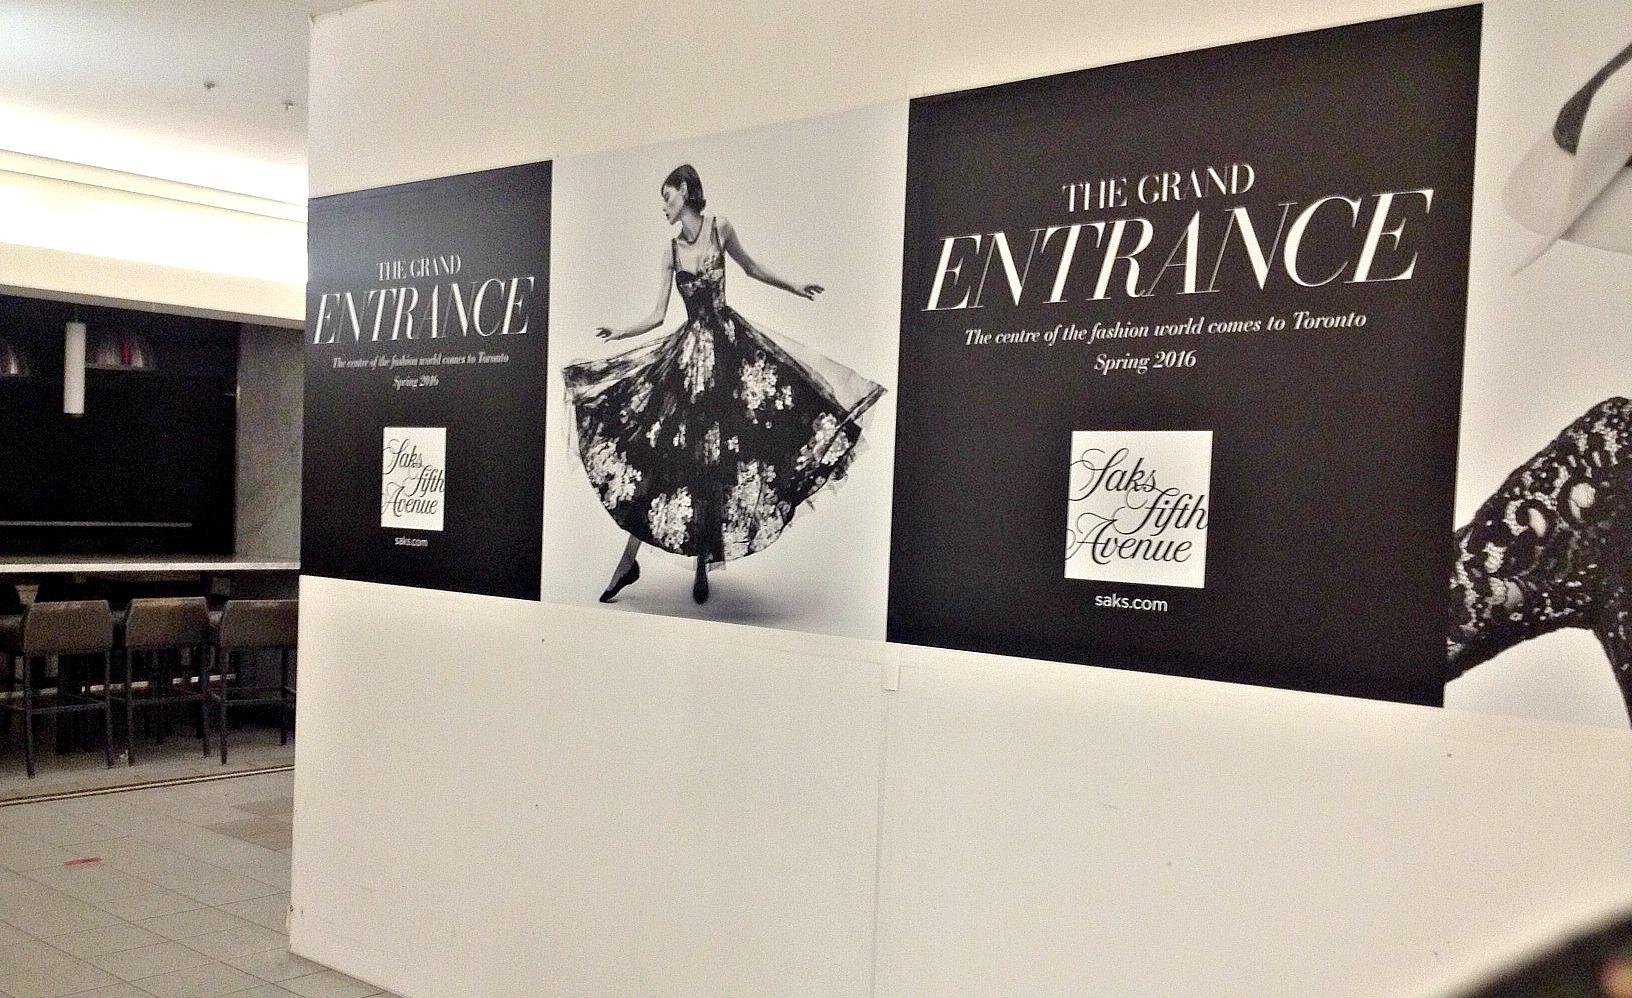 More concourse level construction hoarding features Canadian supermodel Coco Rocha. Photo: Craig Patterson